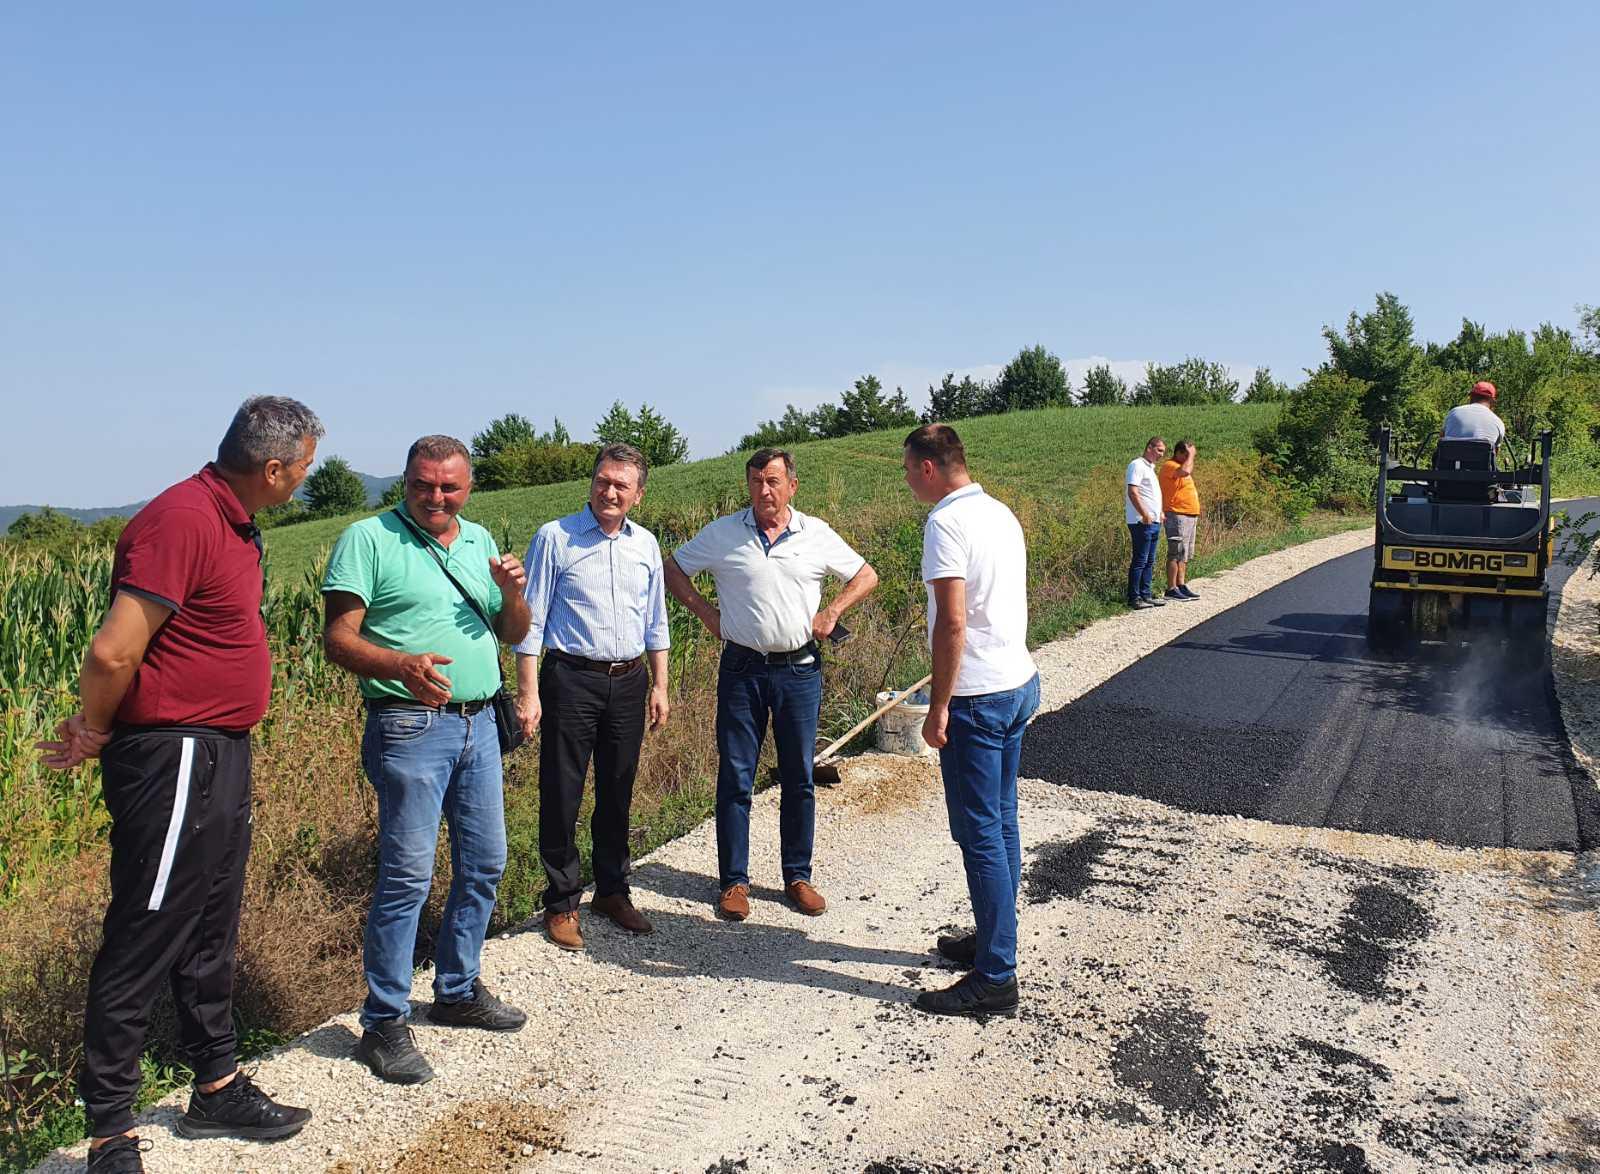 Posebna pažnja izgradnji infrastrukture, Načelnik Ugljevika obišao radove u Mezgraji- Kose